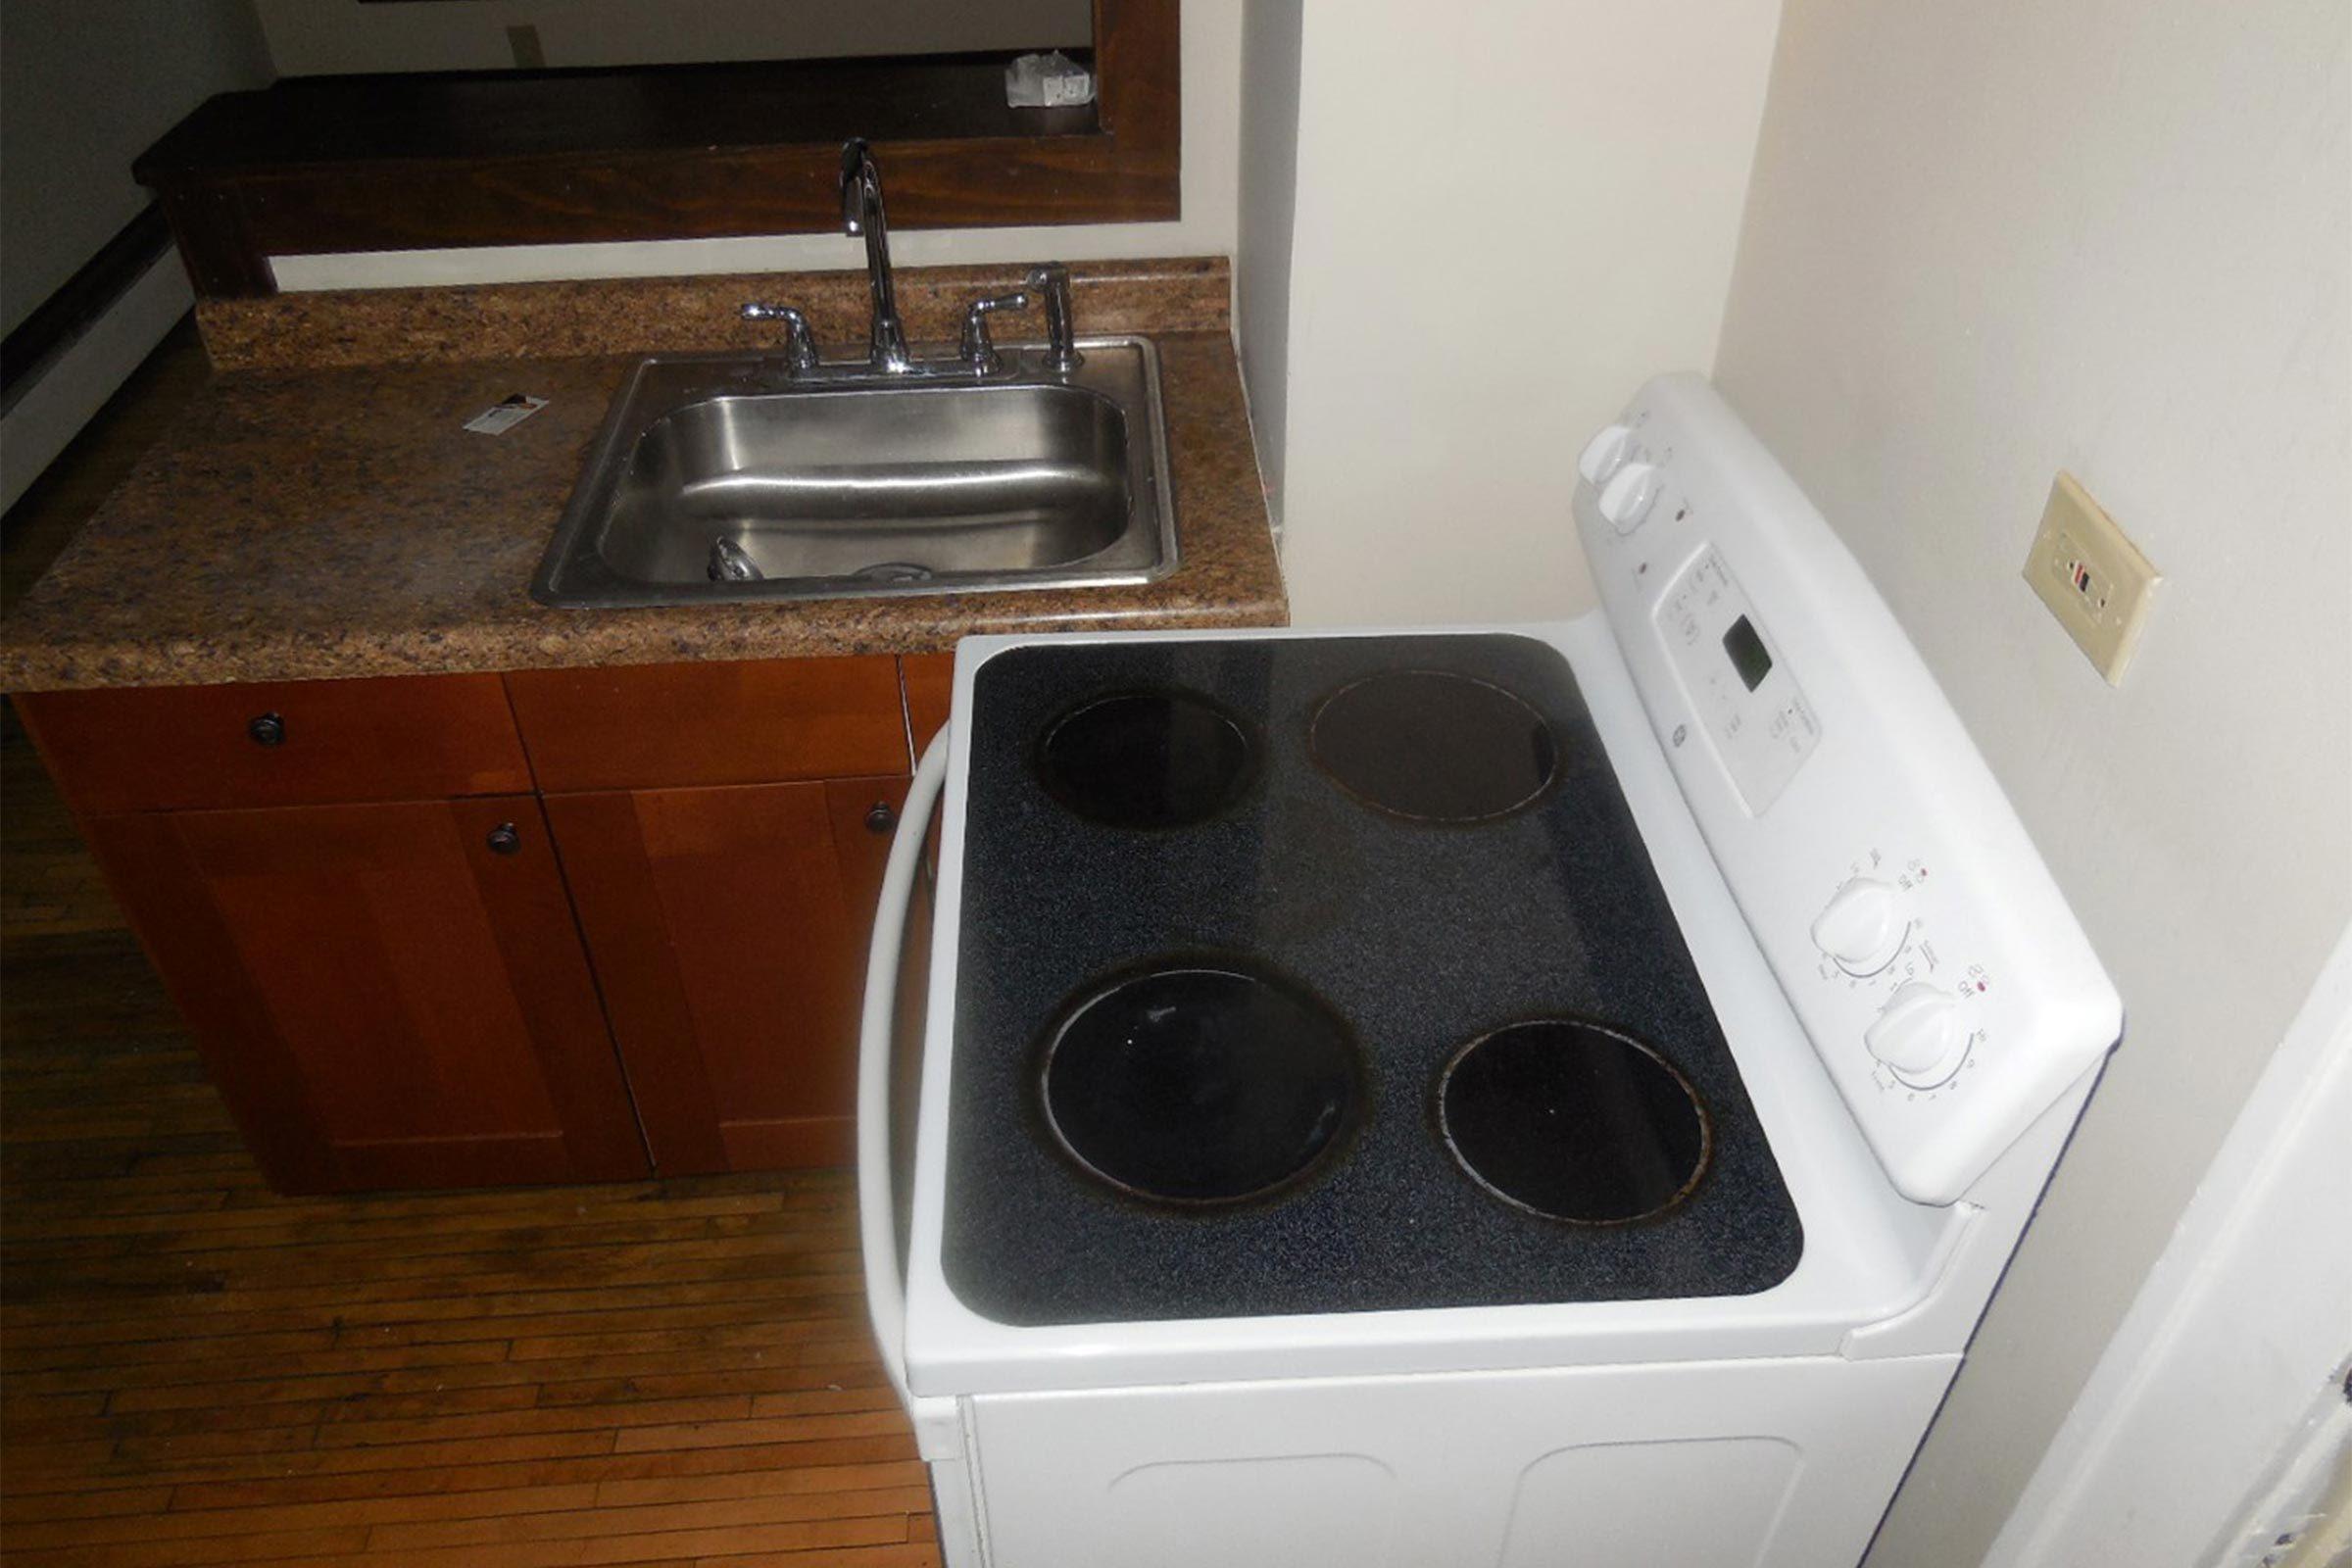 Kitchen Renovation Fails That Will Make You Cringe Reader S Digest